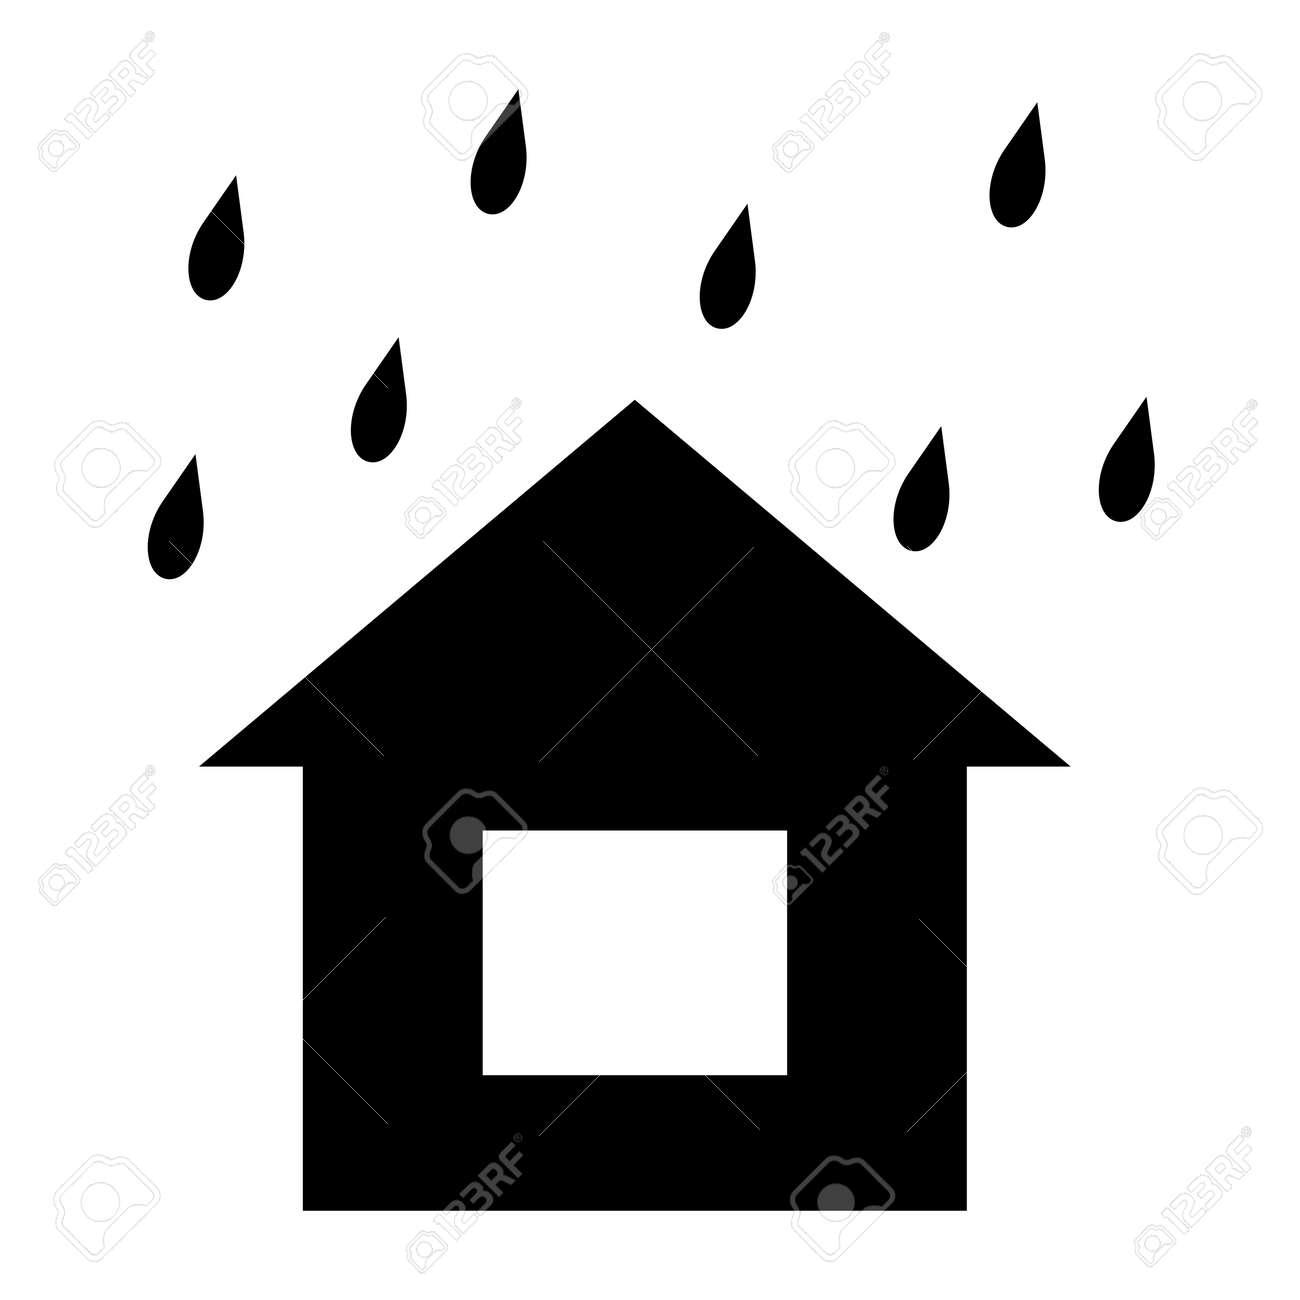 It's raining on the house - 156728609